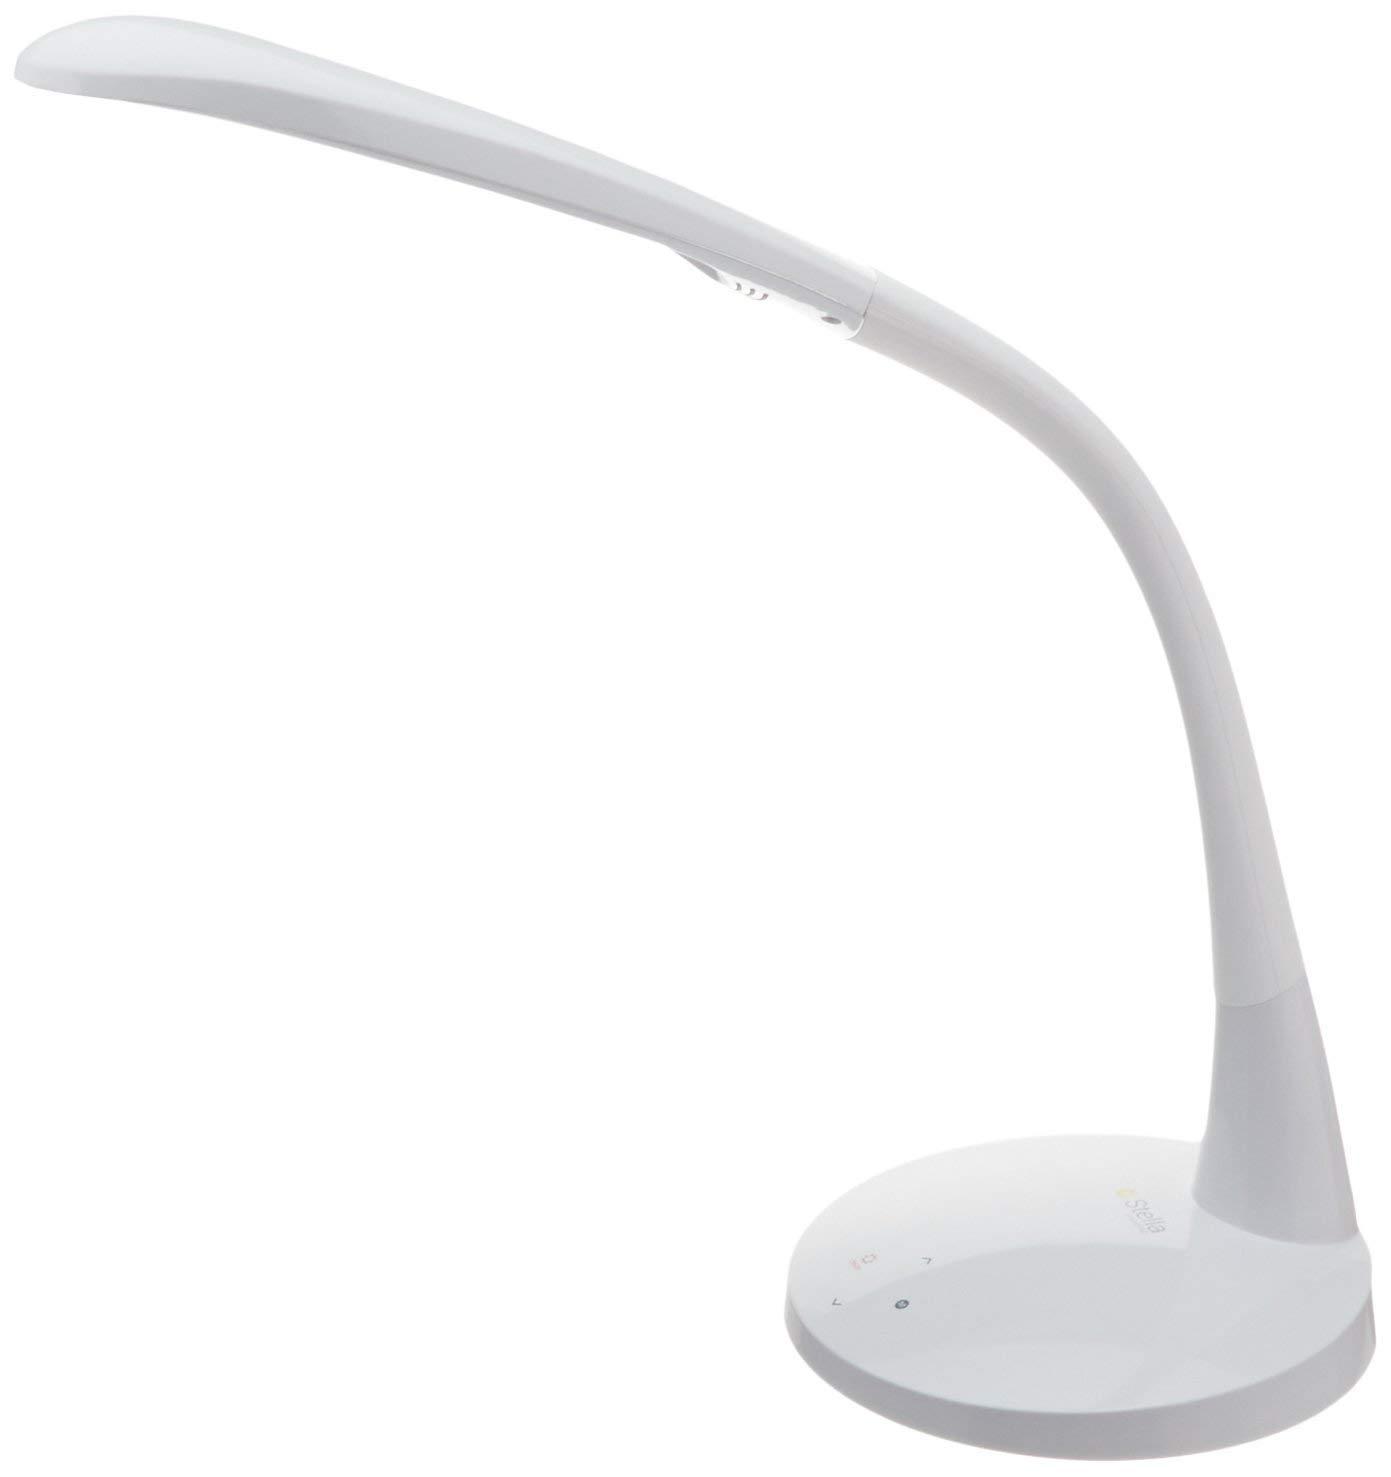 Stella Lighting Stella Original LED Desk Lamp (White) | Hobby, Arts and Crafts, Vision Aid Task Light | Bright Tri-Color Natural Sunlight Mode, Dimming, Flex Arm, No Bulb, 10W